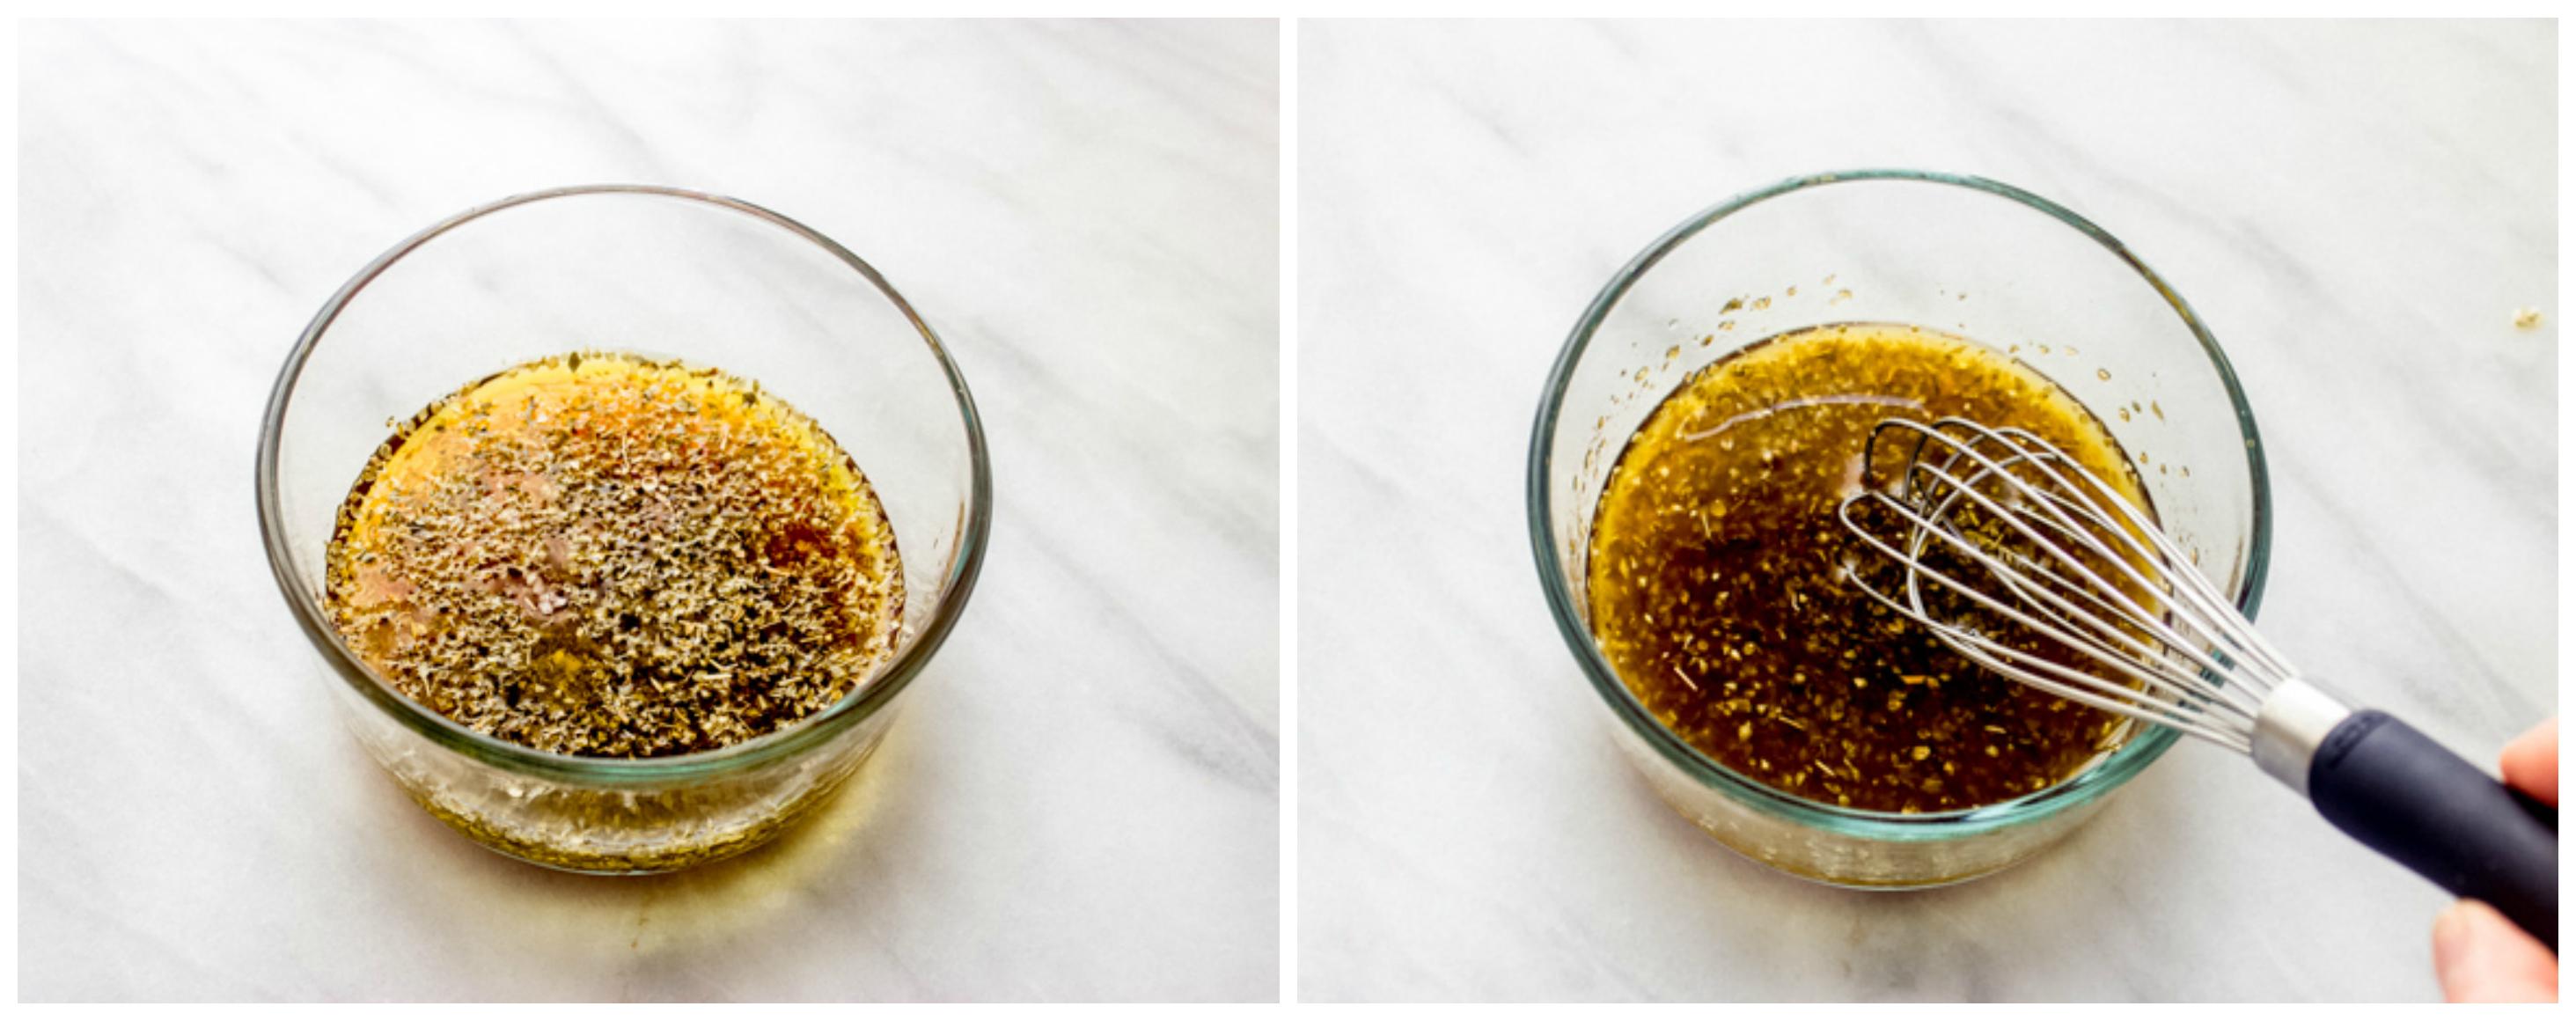 Oregano vinaigrette in glass bowl